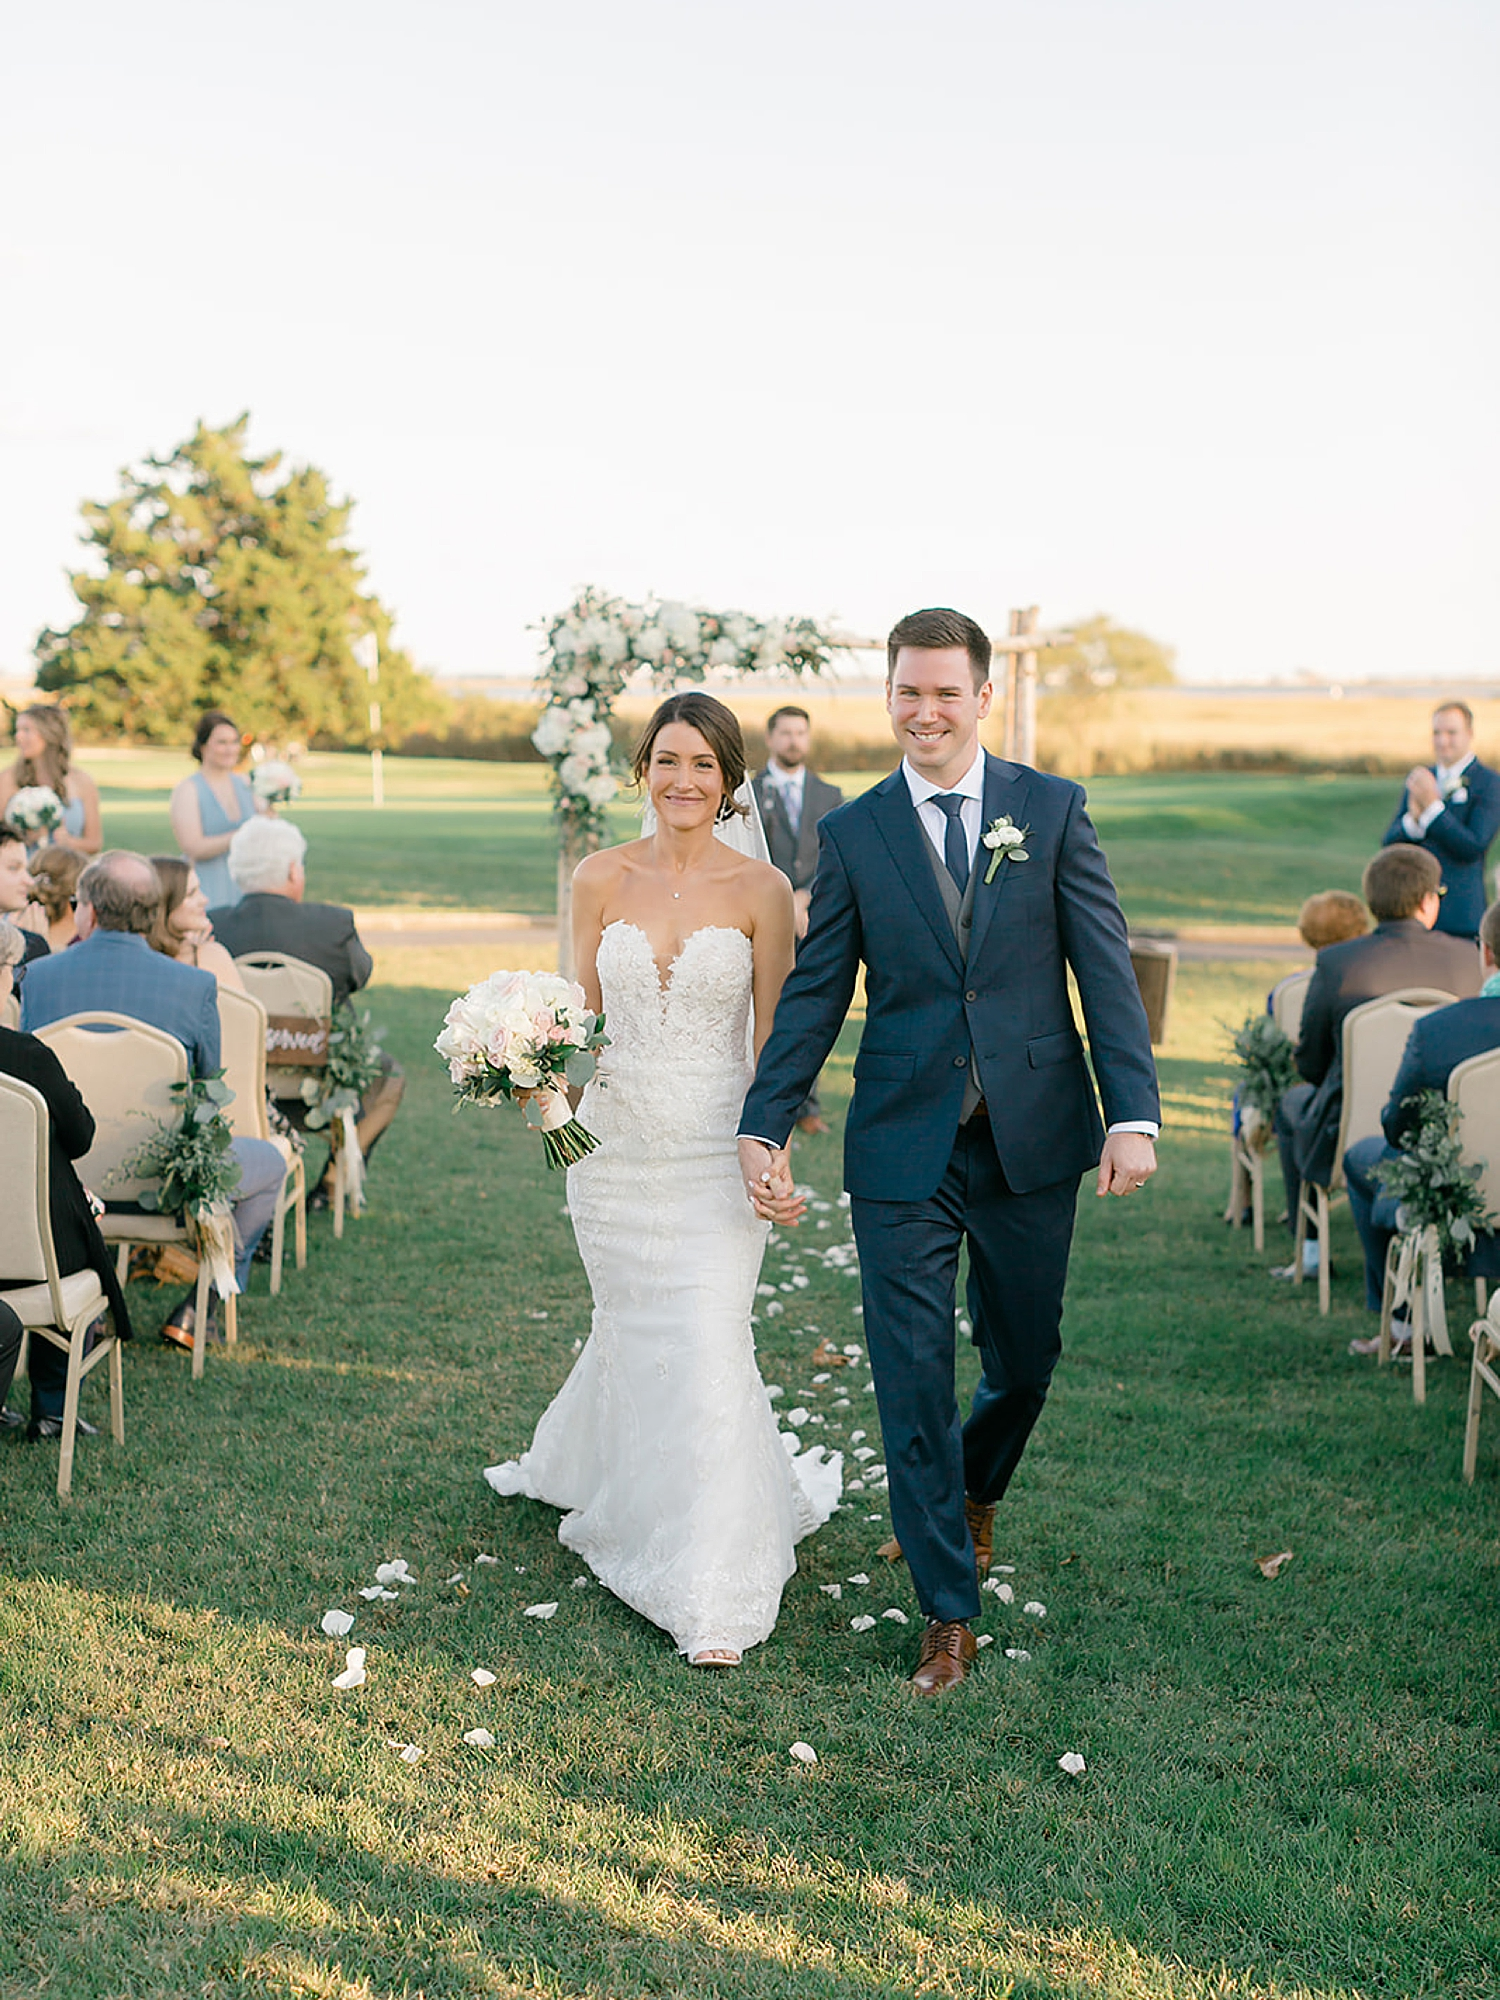 Linwood Country Club Wedding Photography by Magdalena Studios KatieTom0043